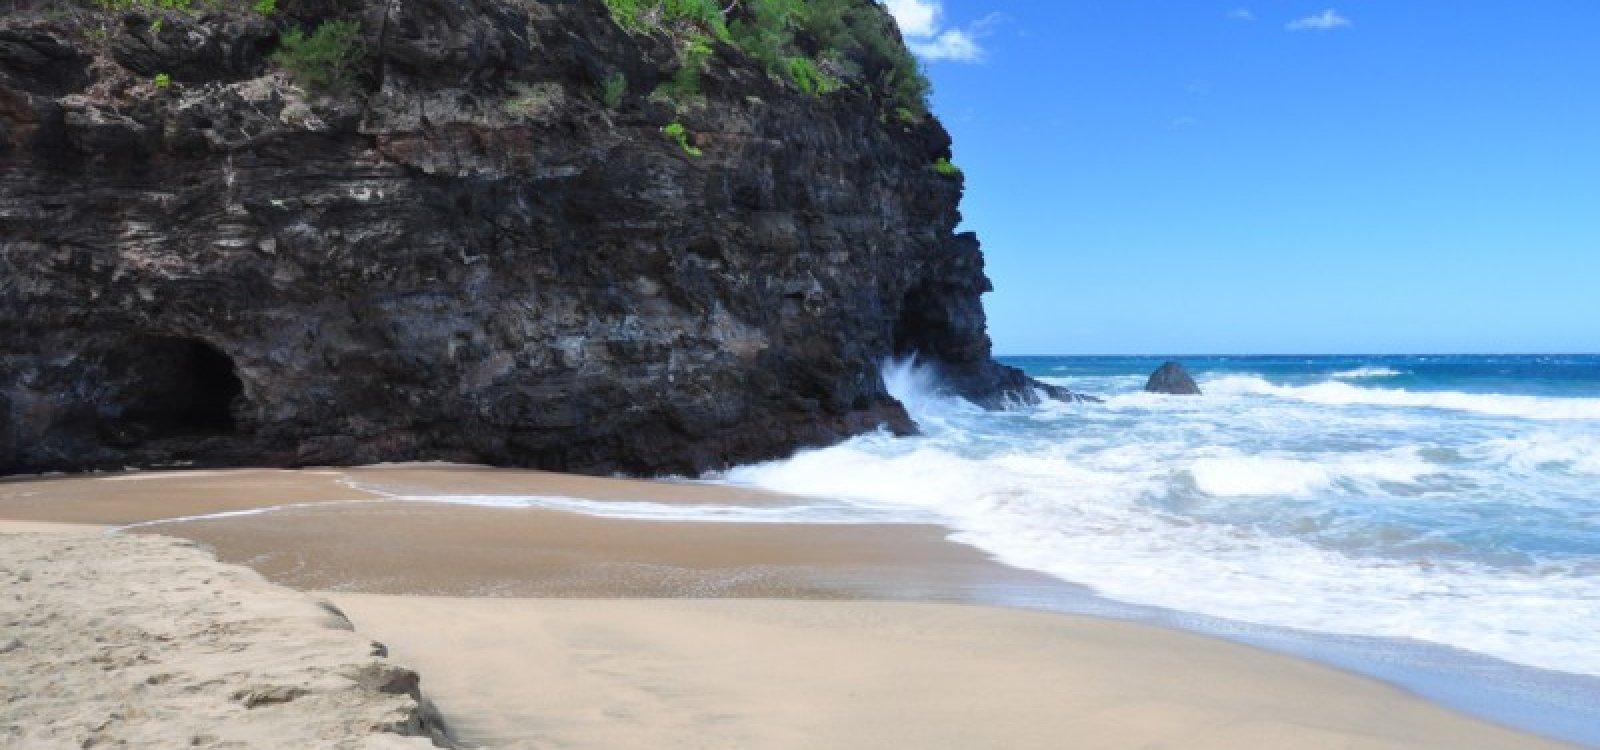 hanakapiai beach is a deadly beach